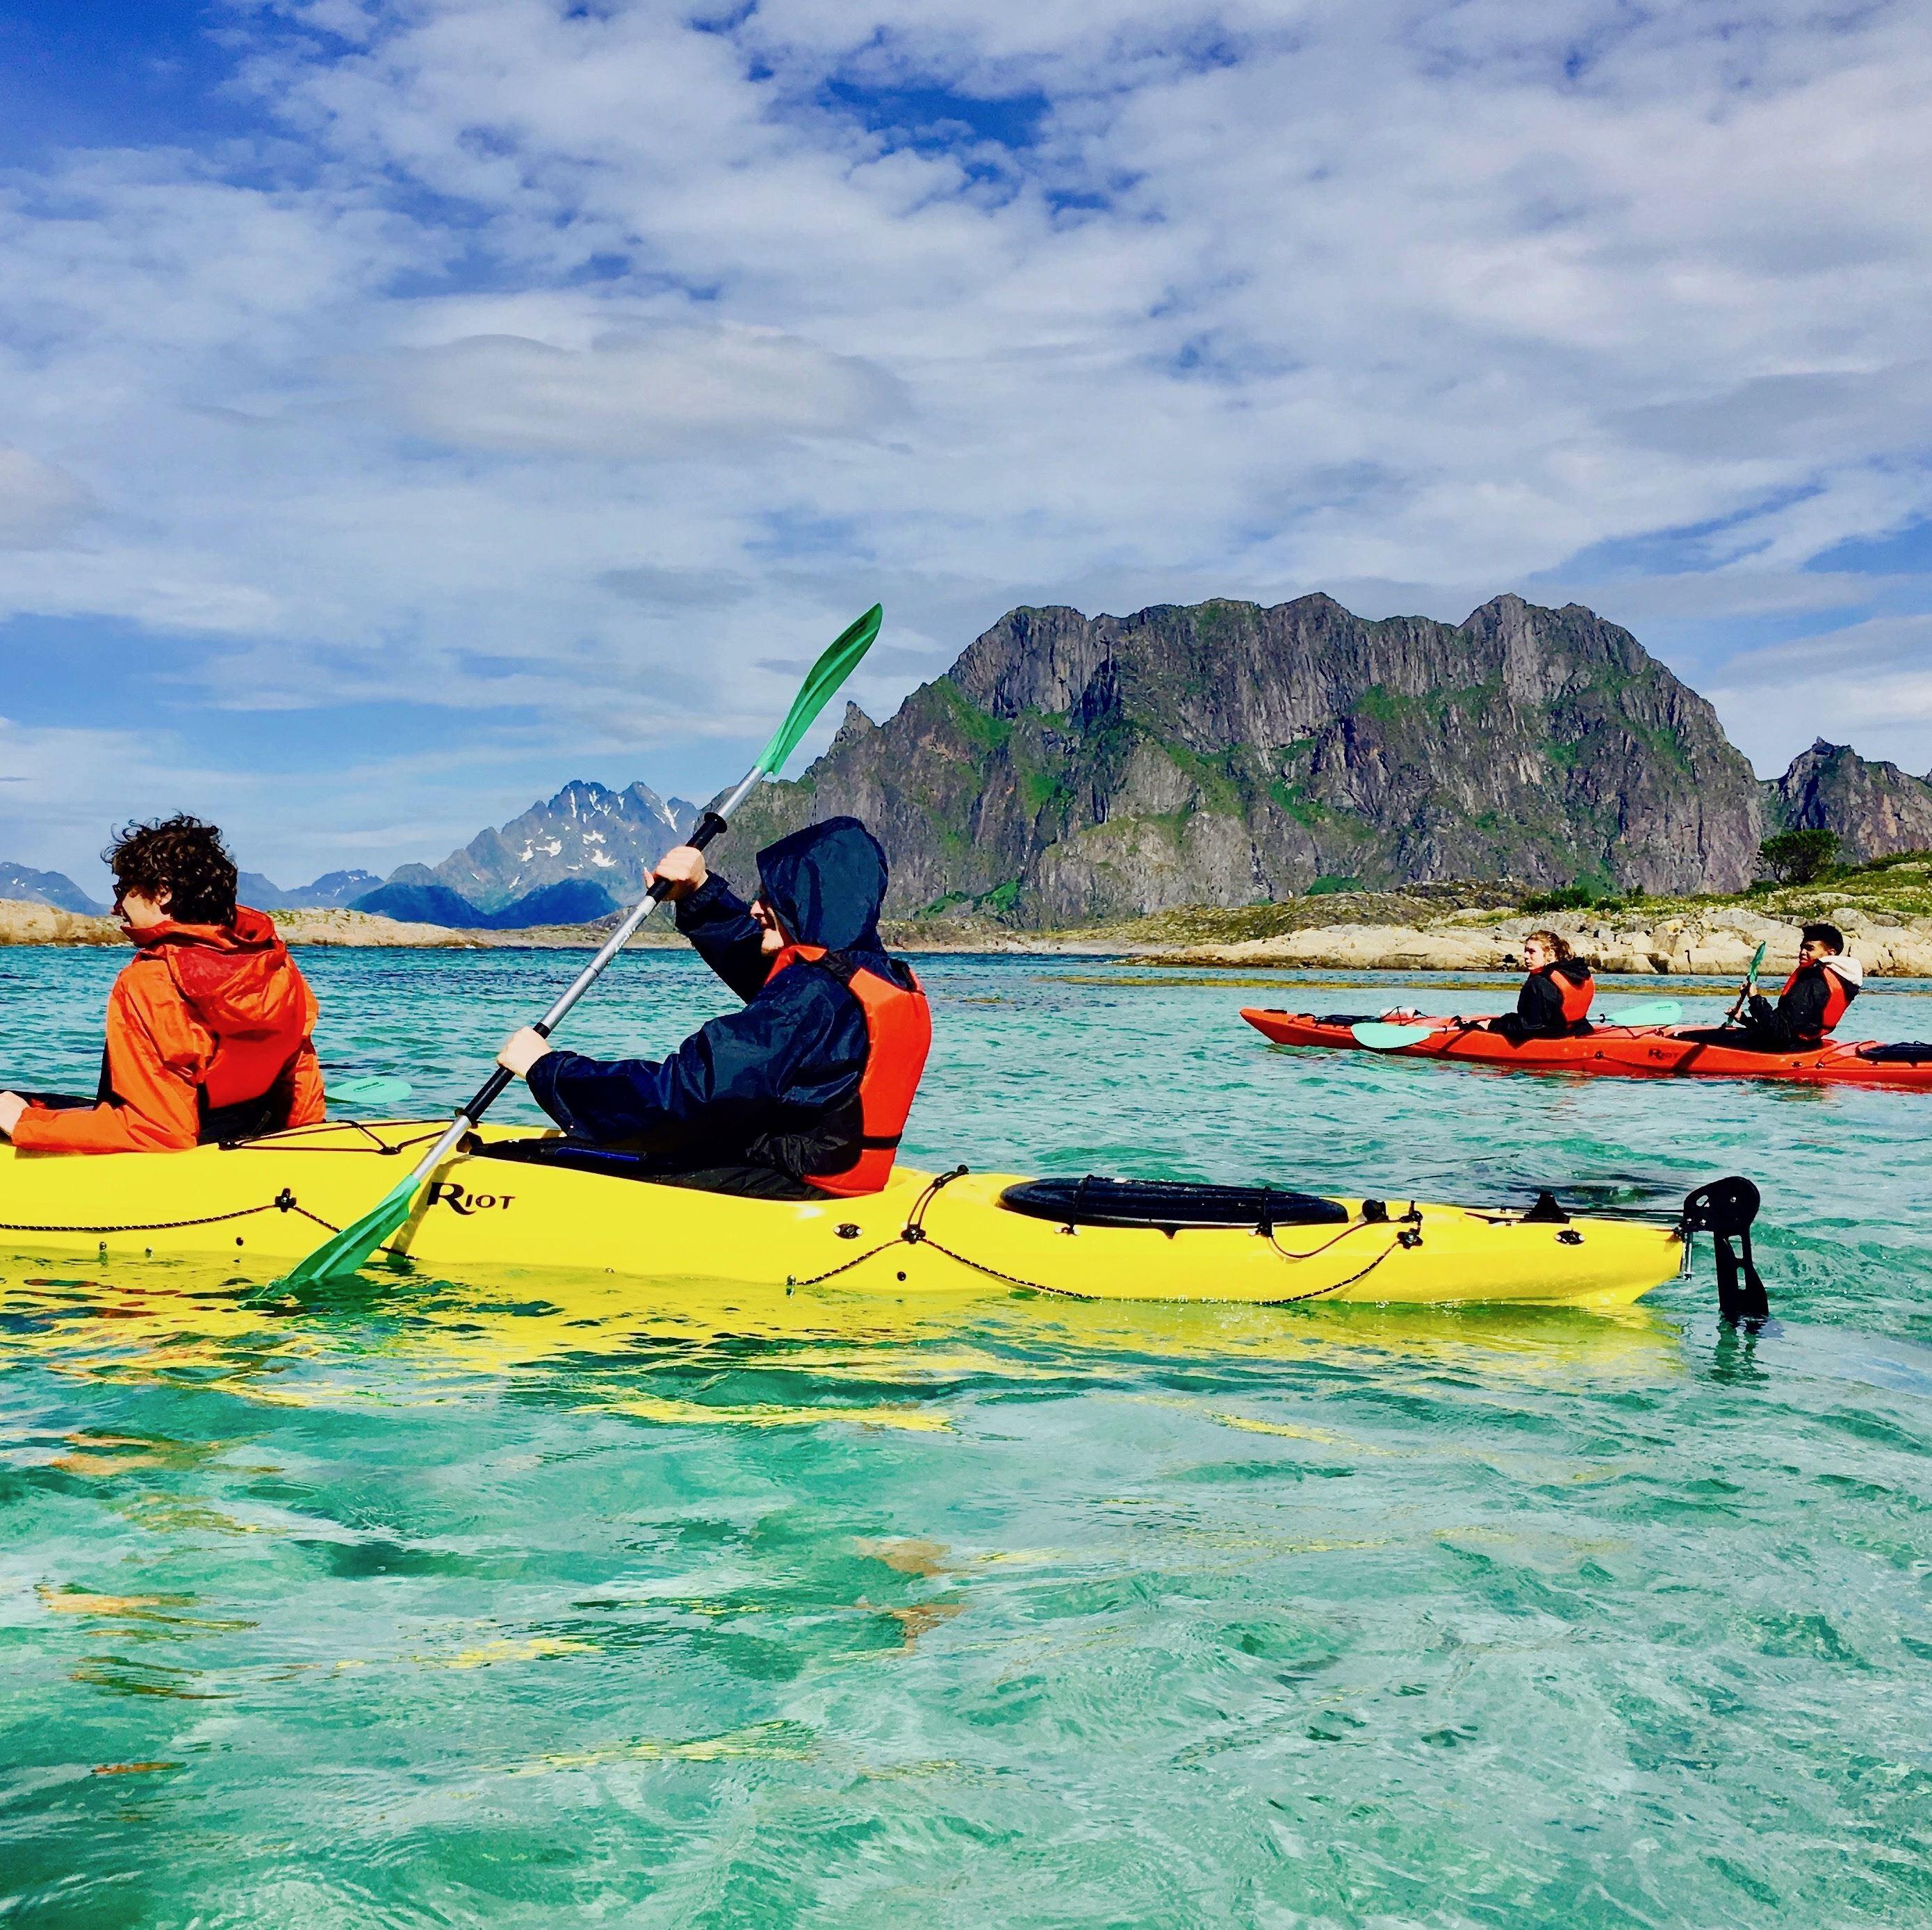 Trollfjord Cruise & Kajakk Tur